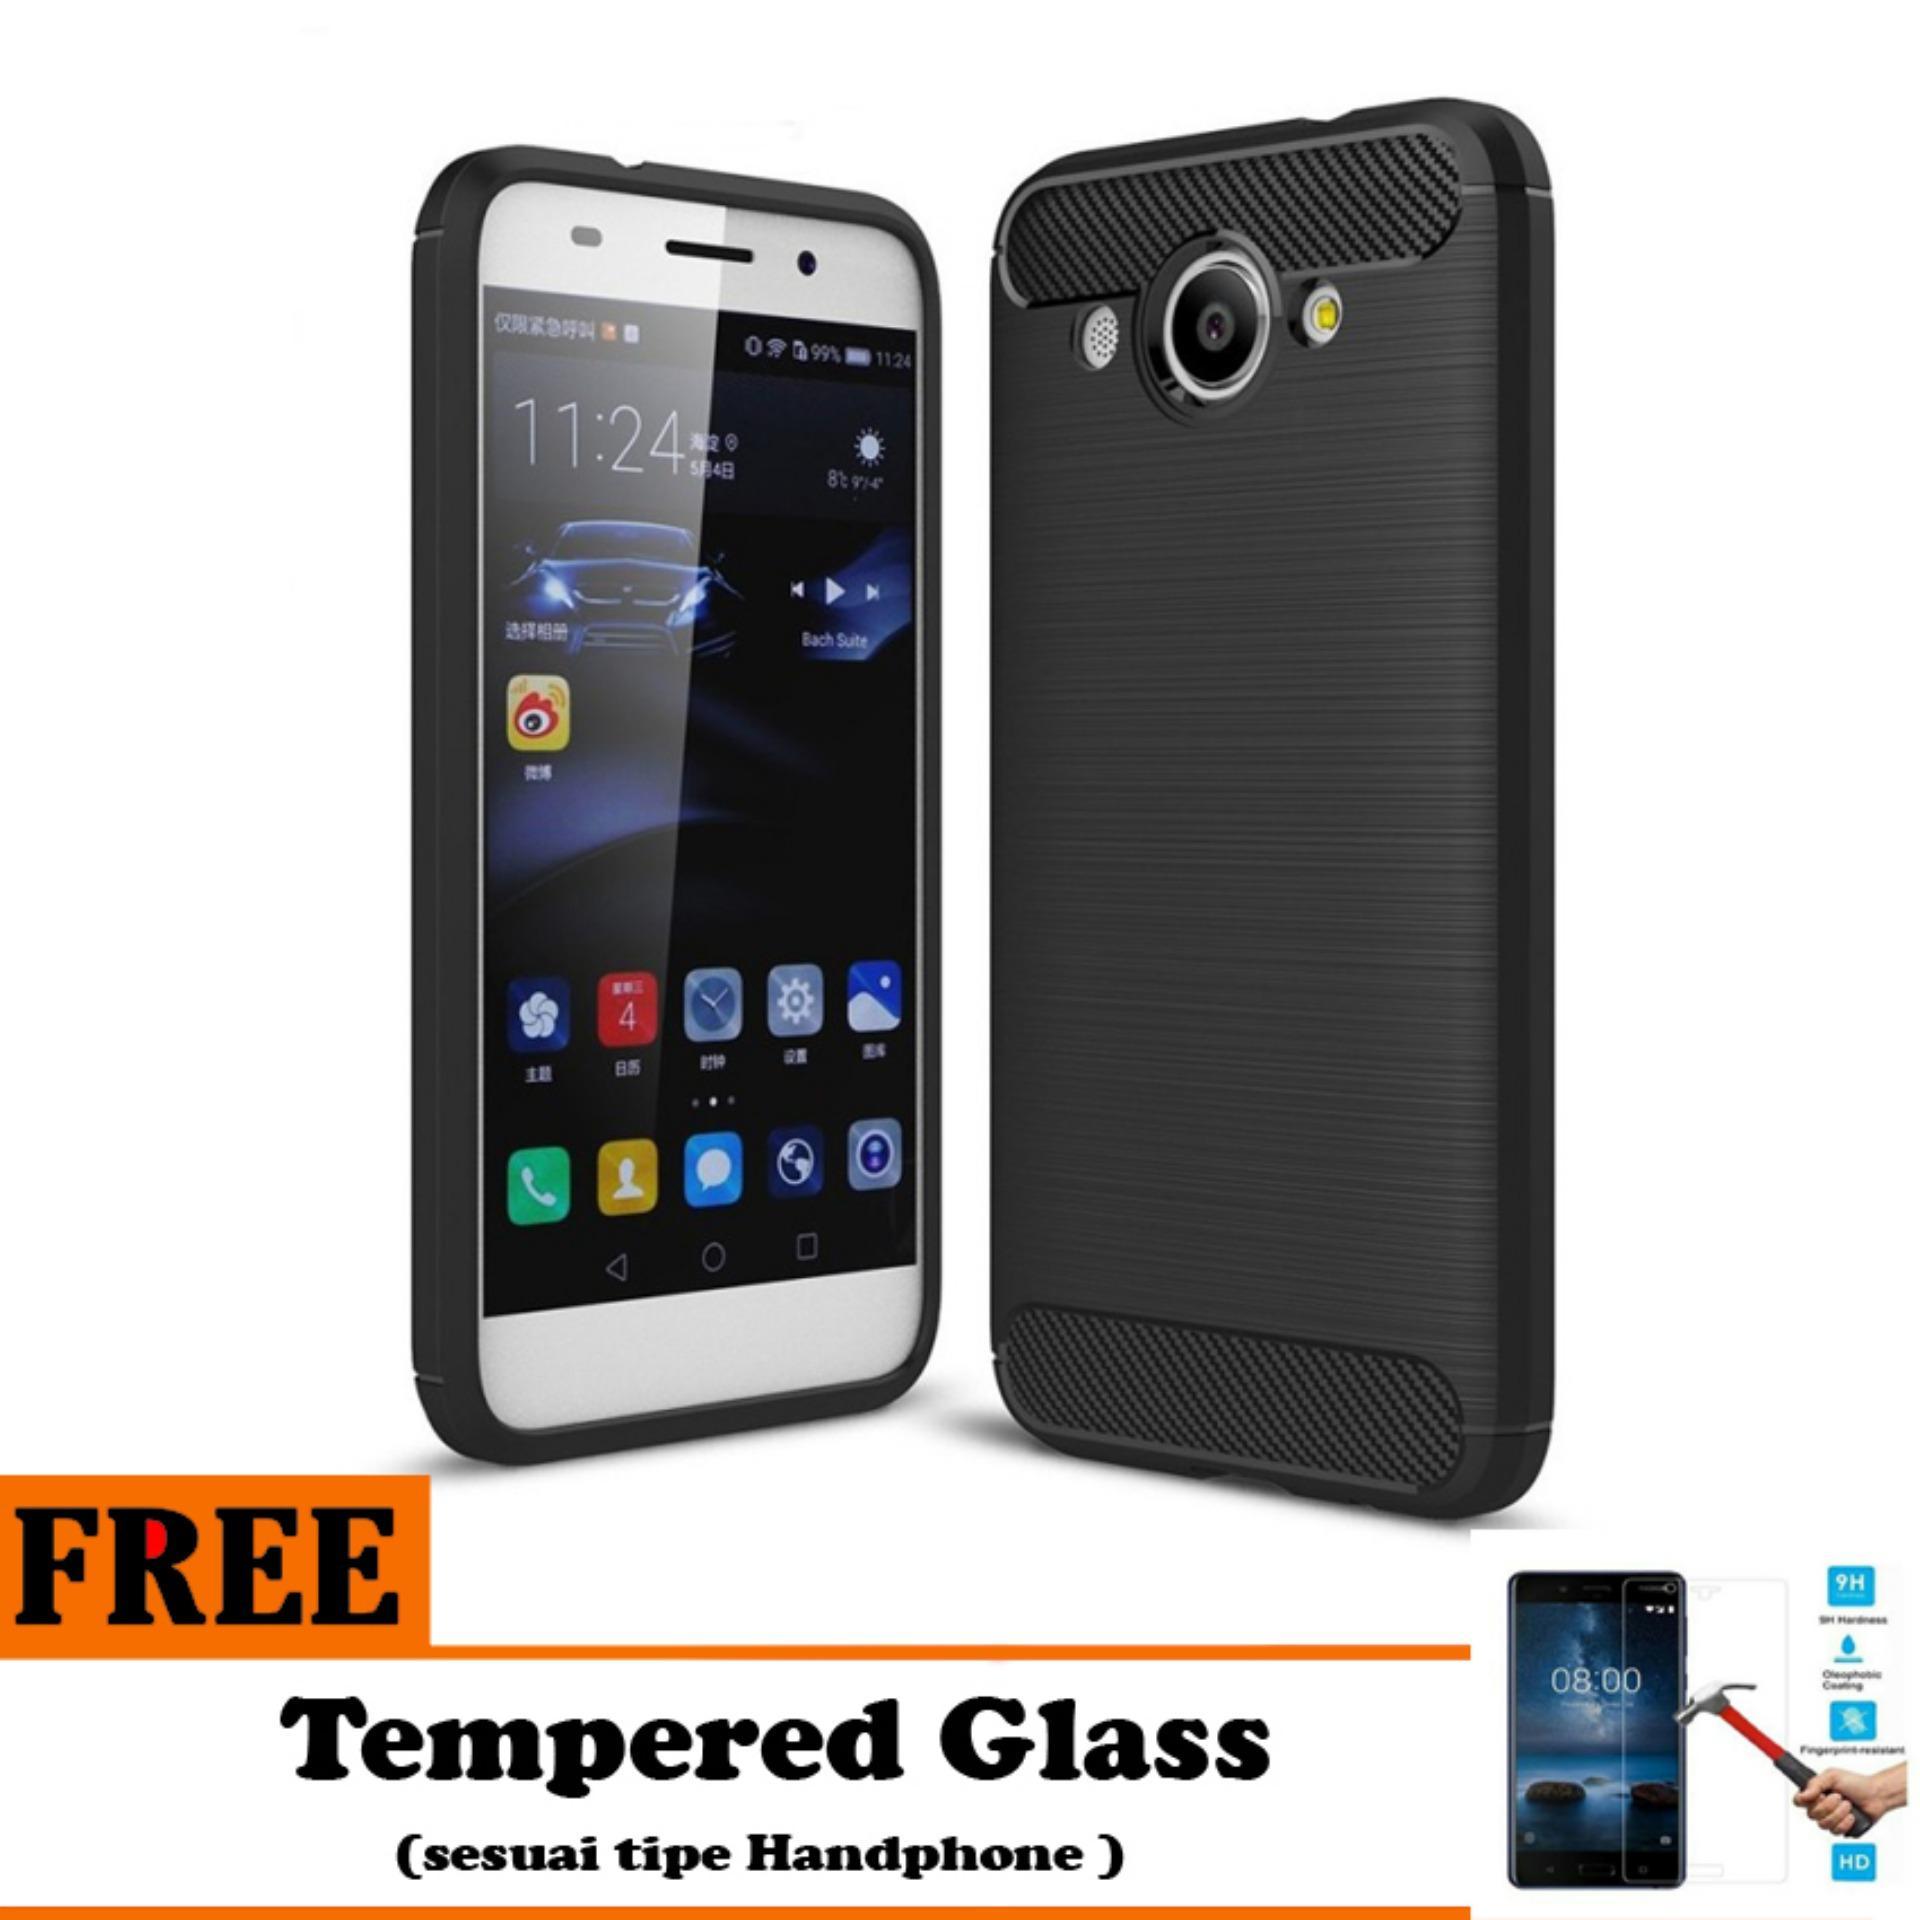 Softcase Ipaky Shockproof Matte Black karbon untuk Huawei Y3 2017   - Free Tempered Glass